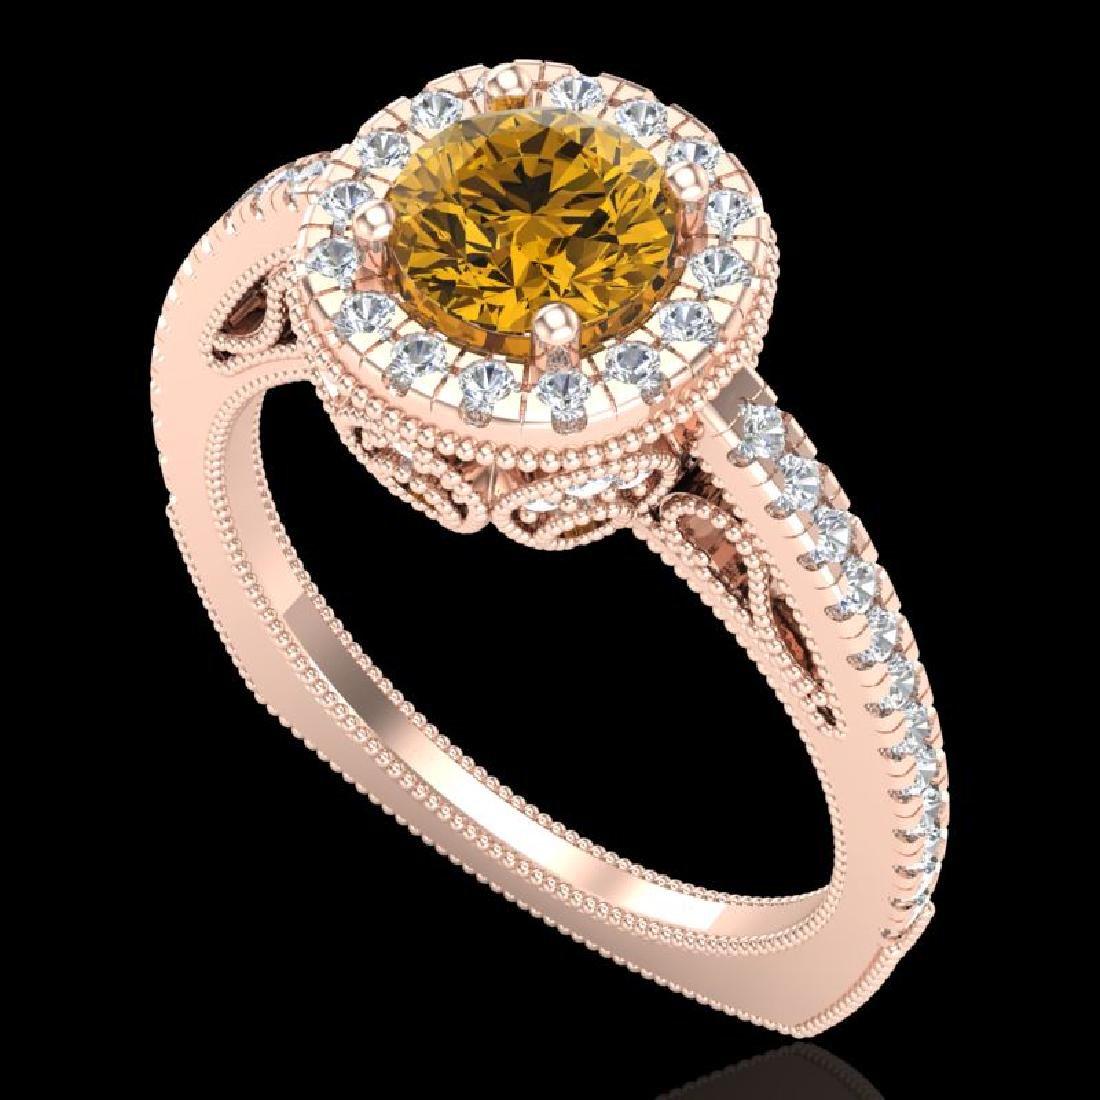 1.55 CTW Intense Fancy Yellow Diamond Engagement Art